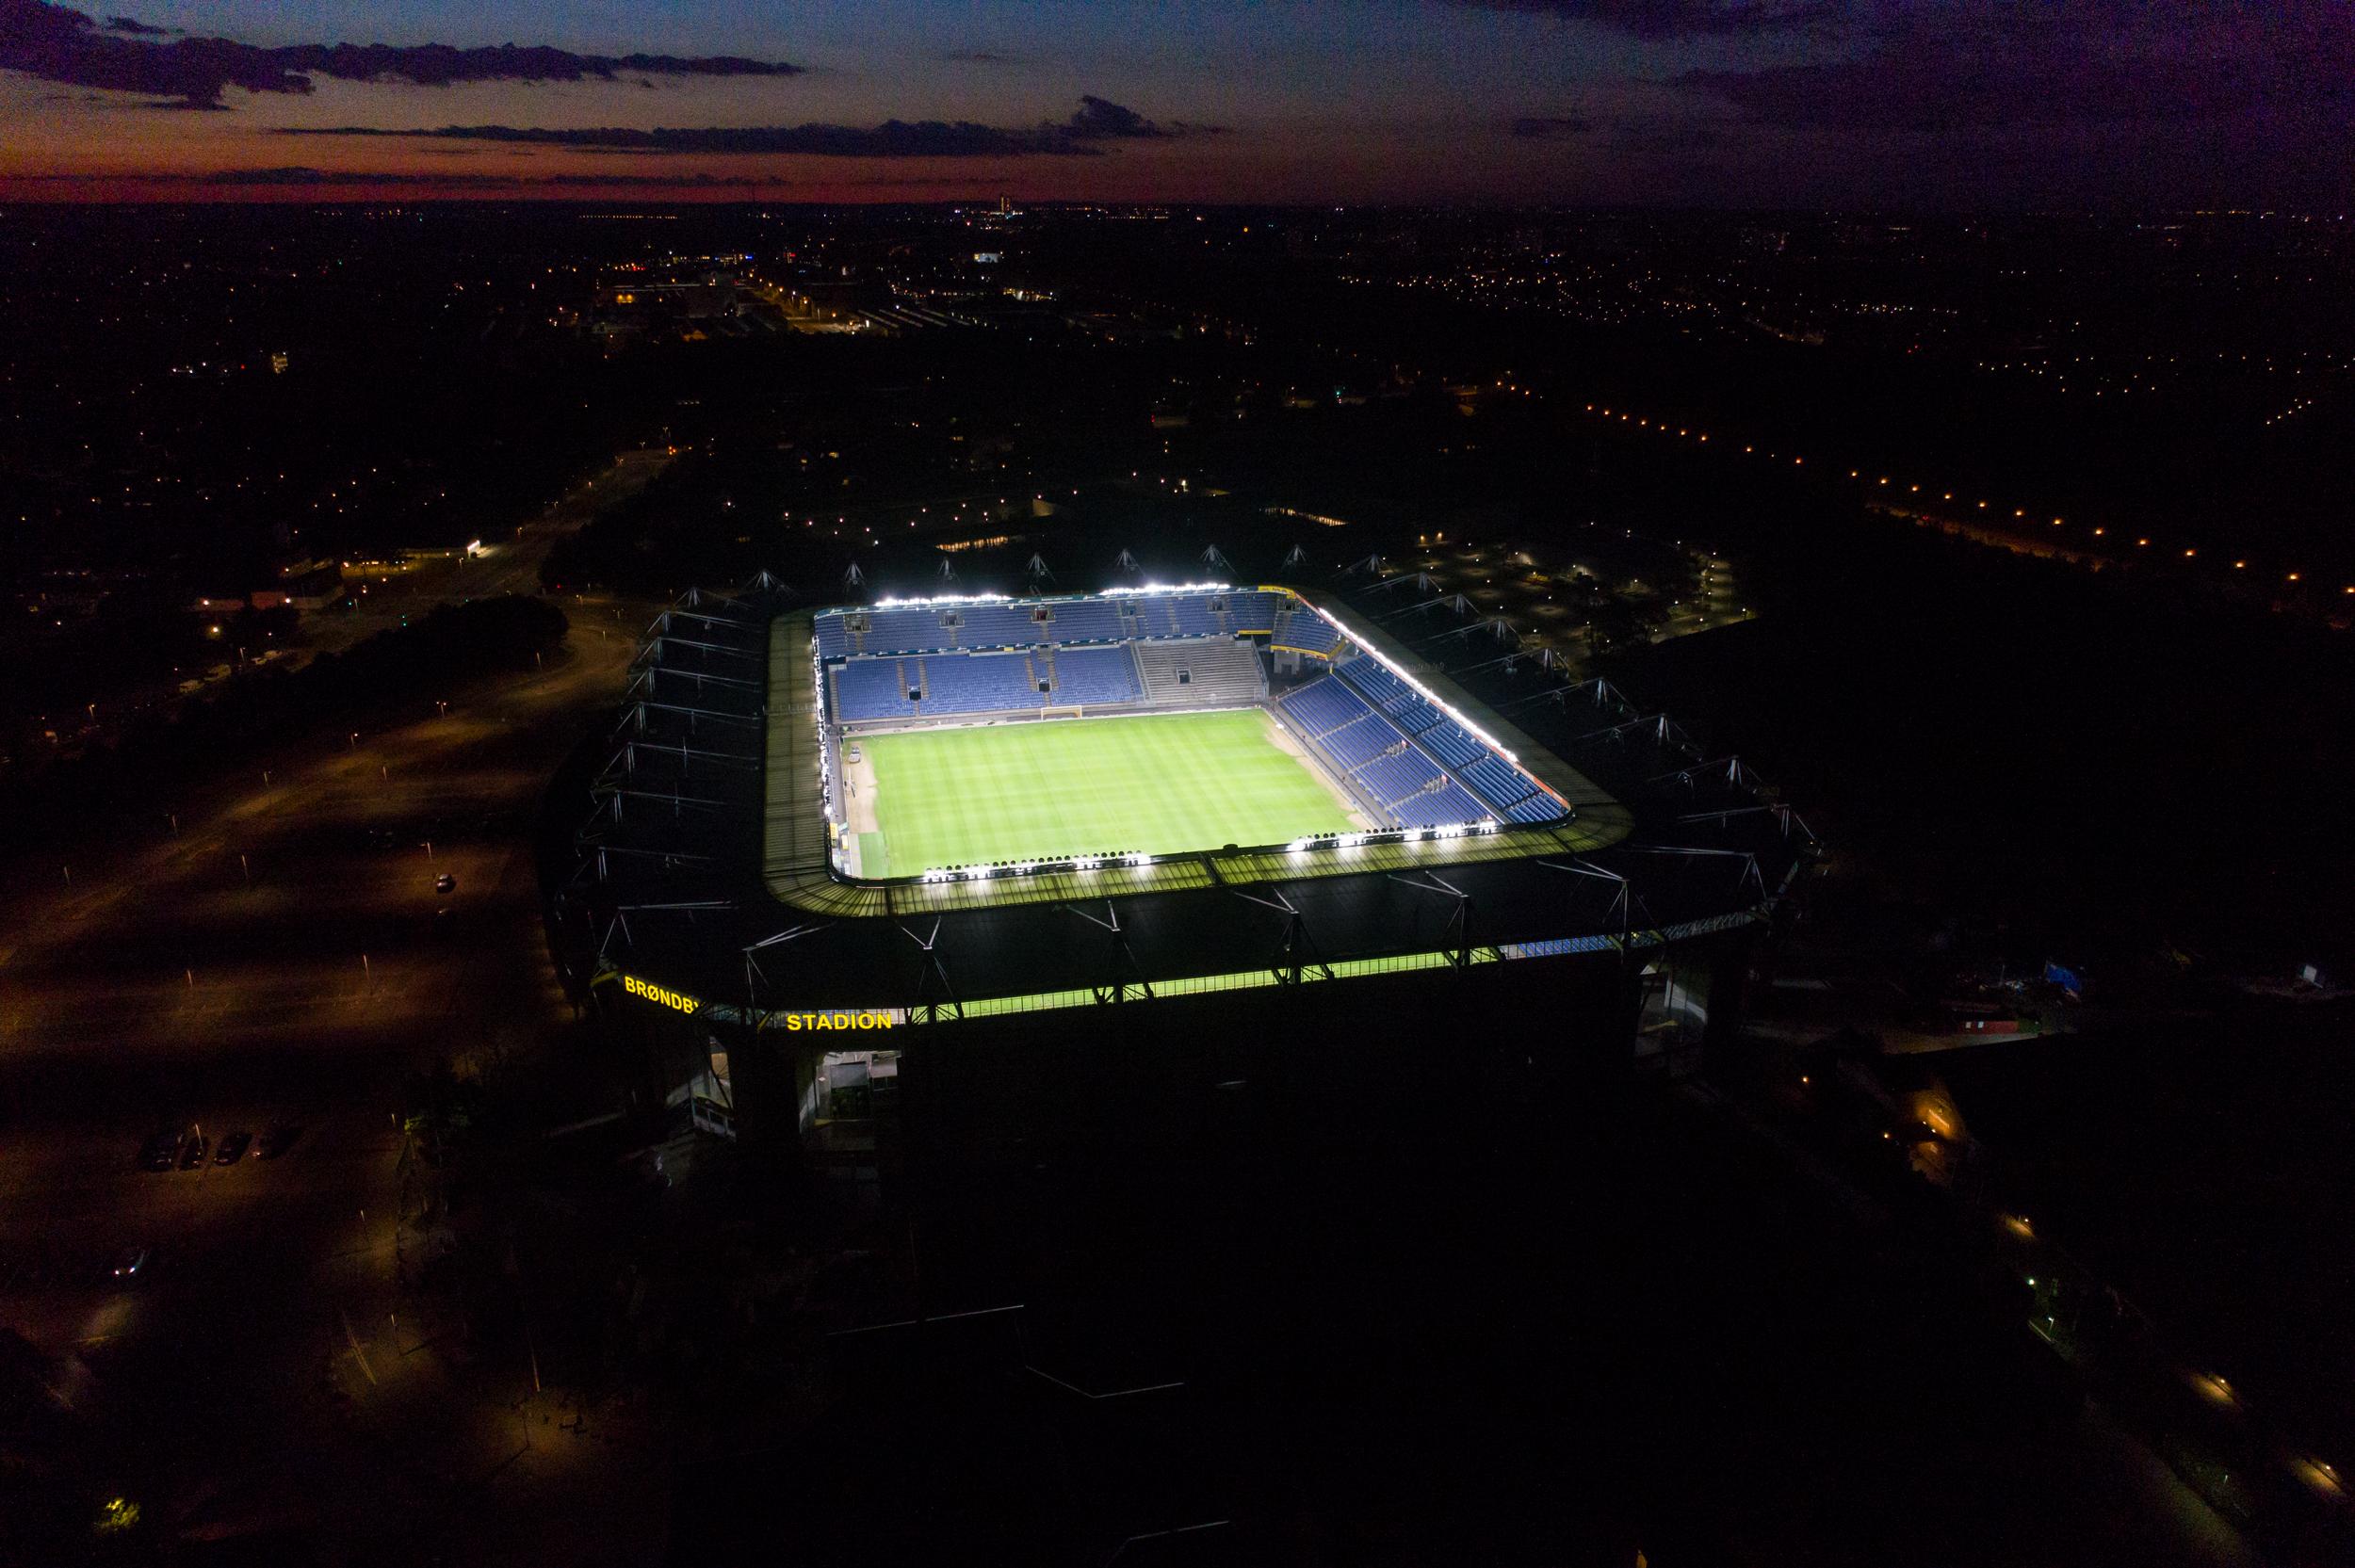 photo: Brondby IF's stadium